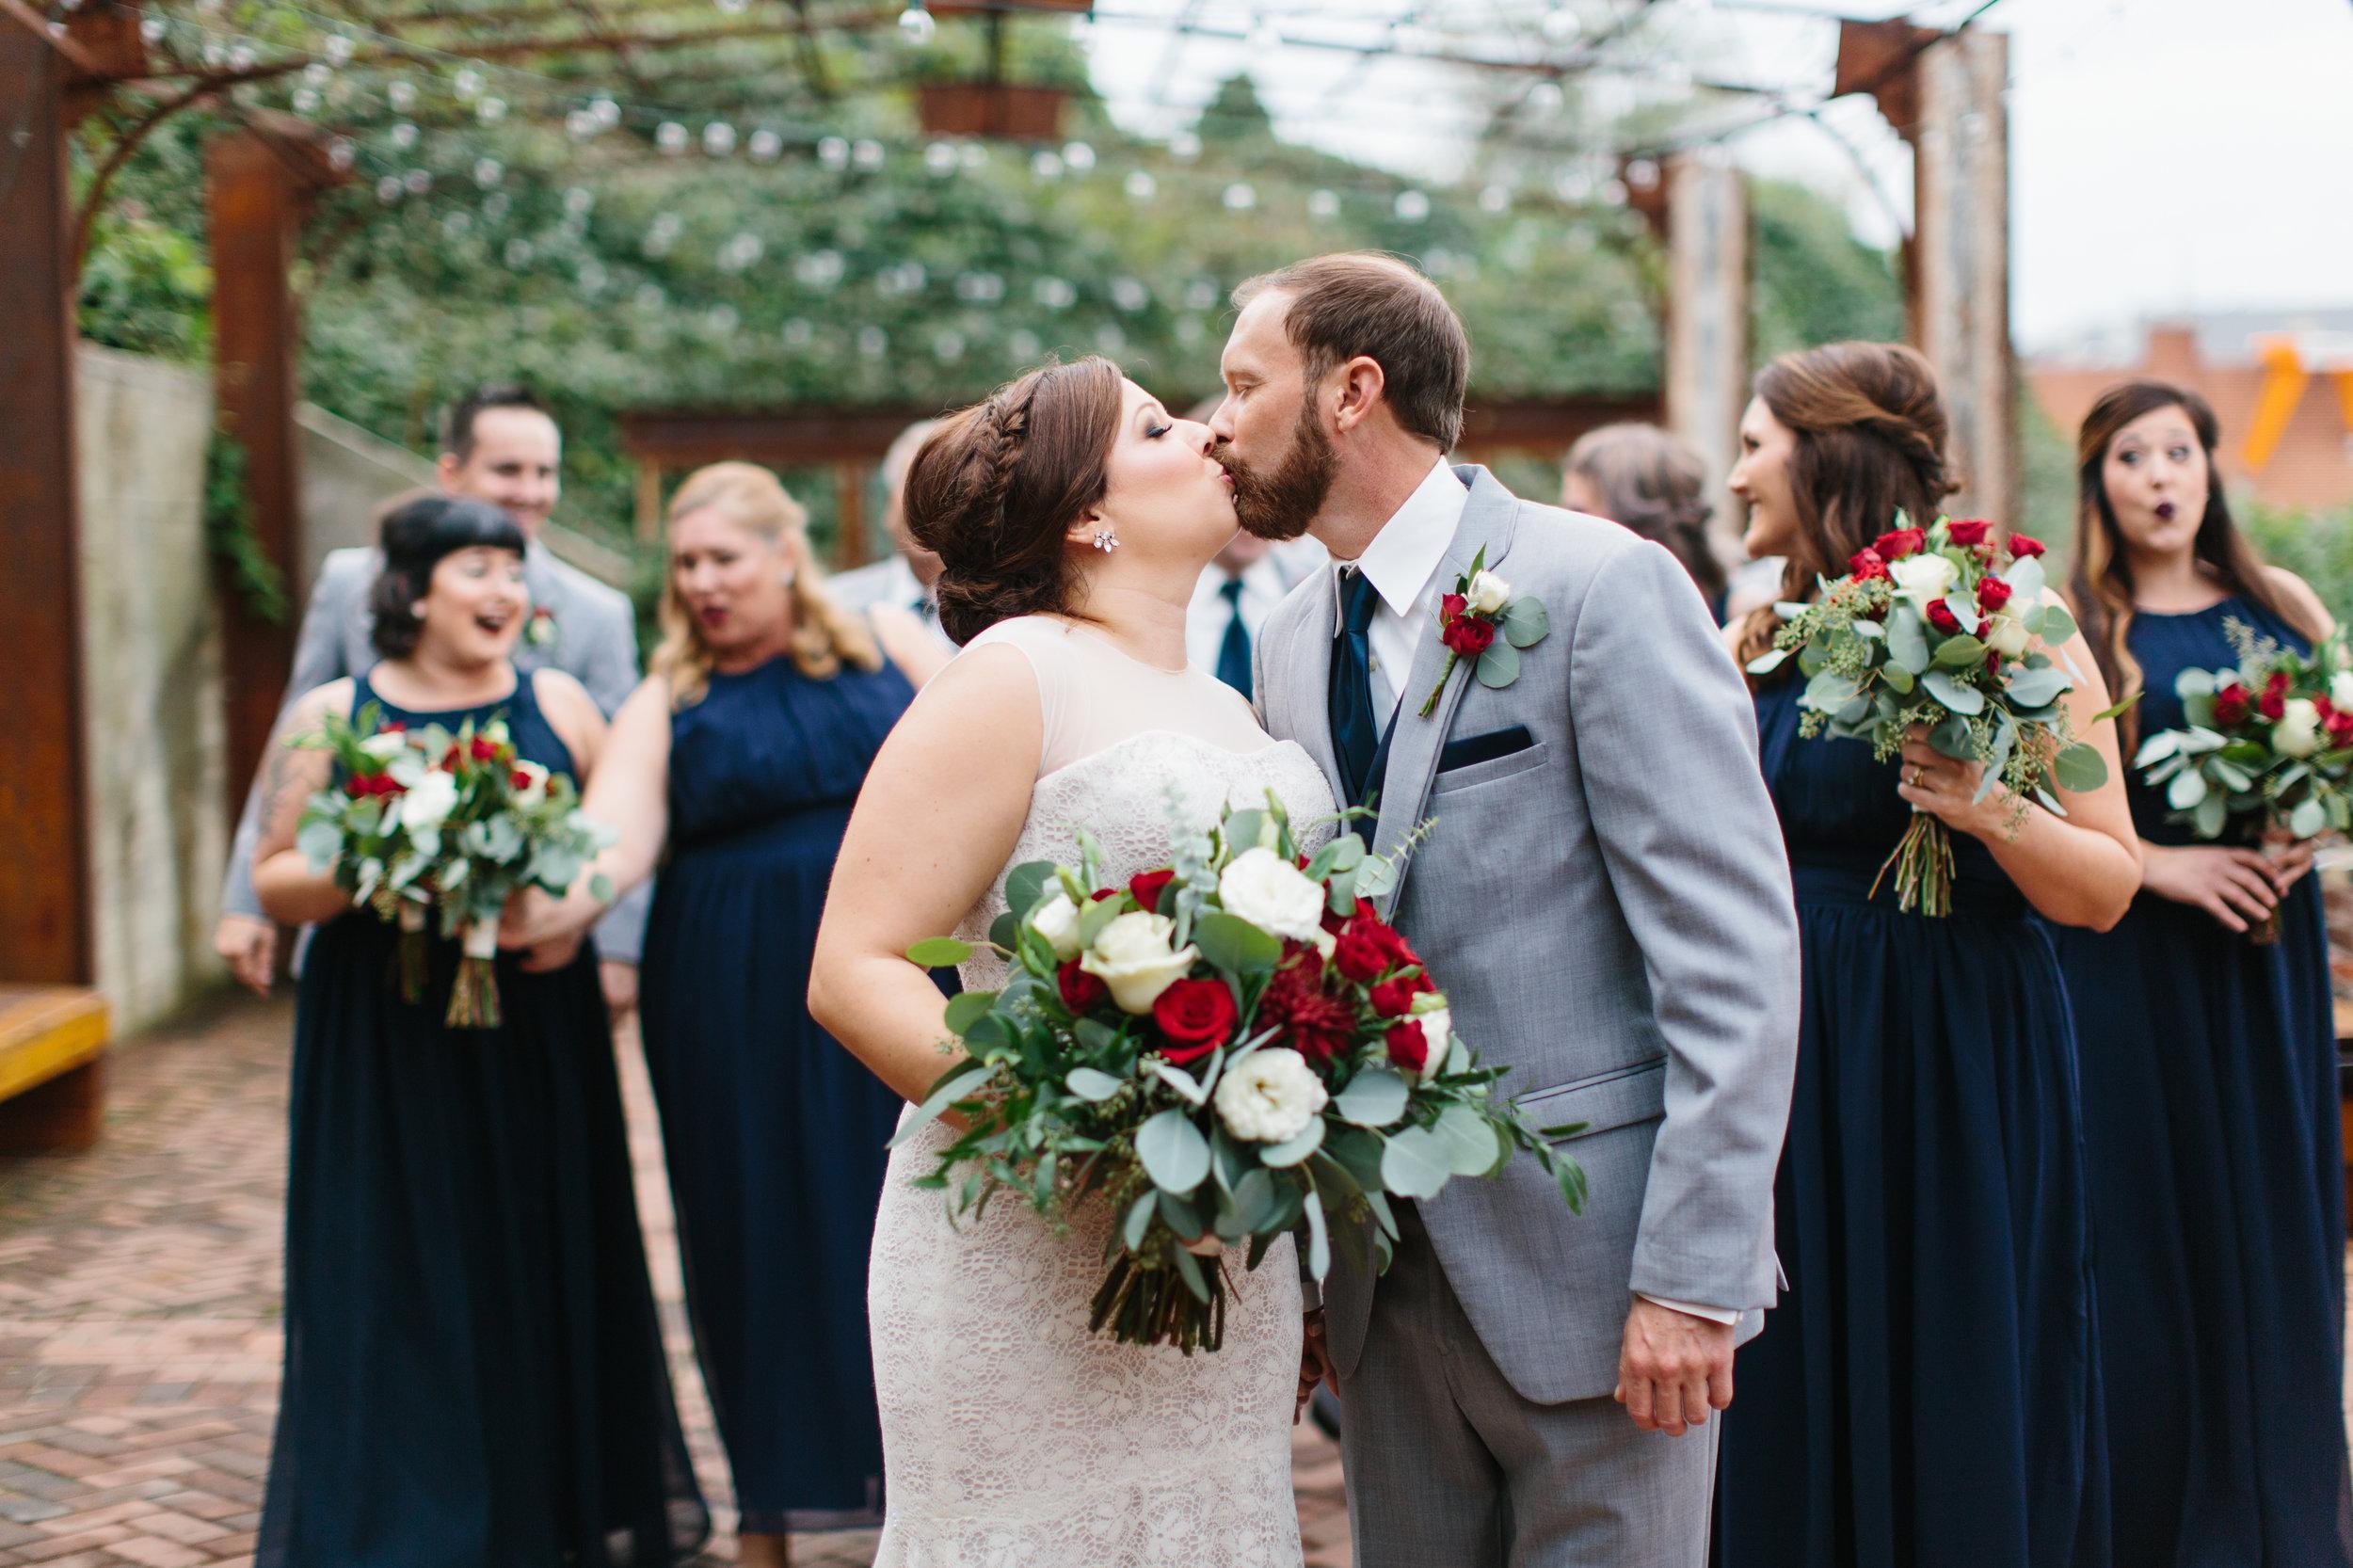 Jessica_Bryan_Wedding_Standard_Knoxville_Abigail_Malone_Photography-333.jpg